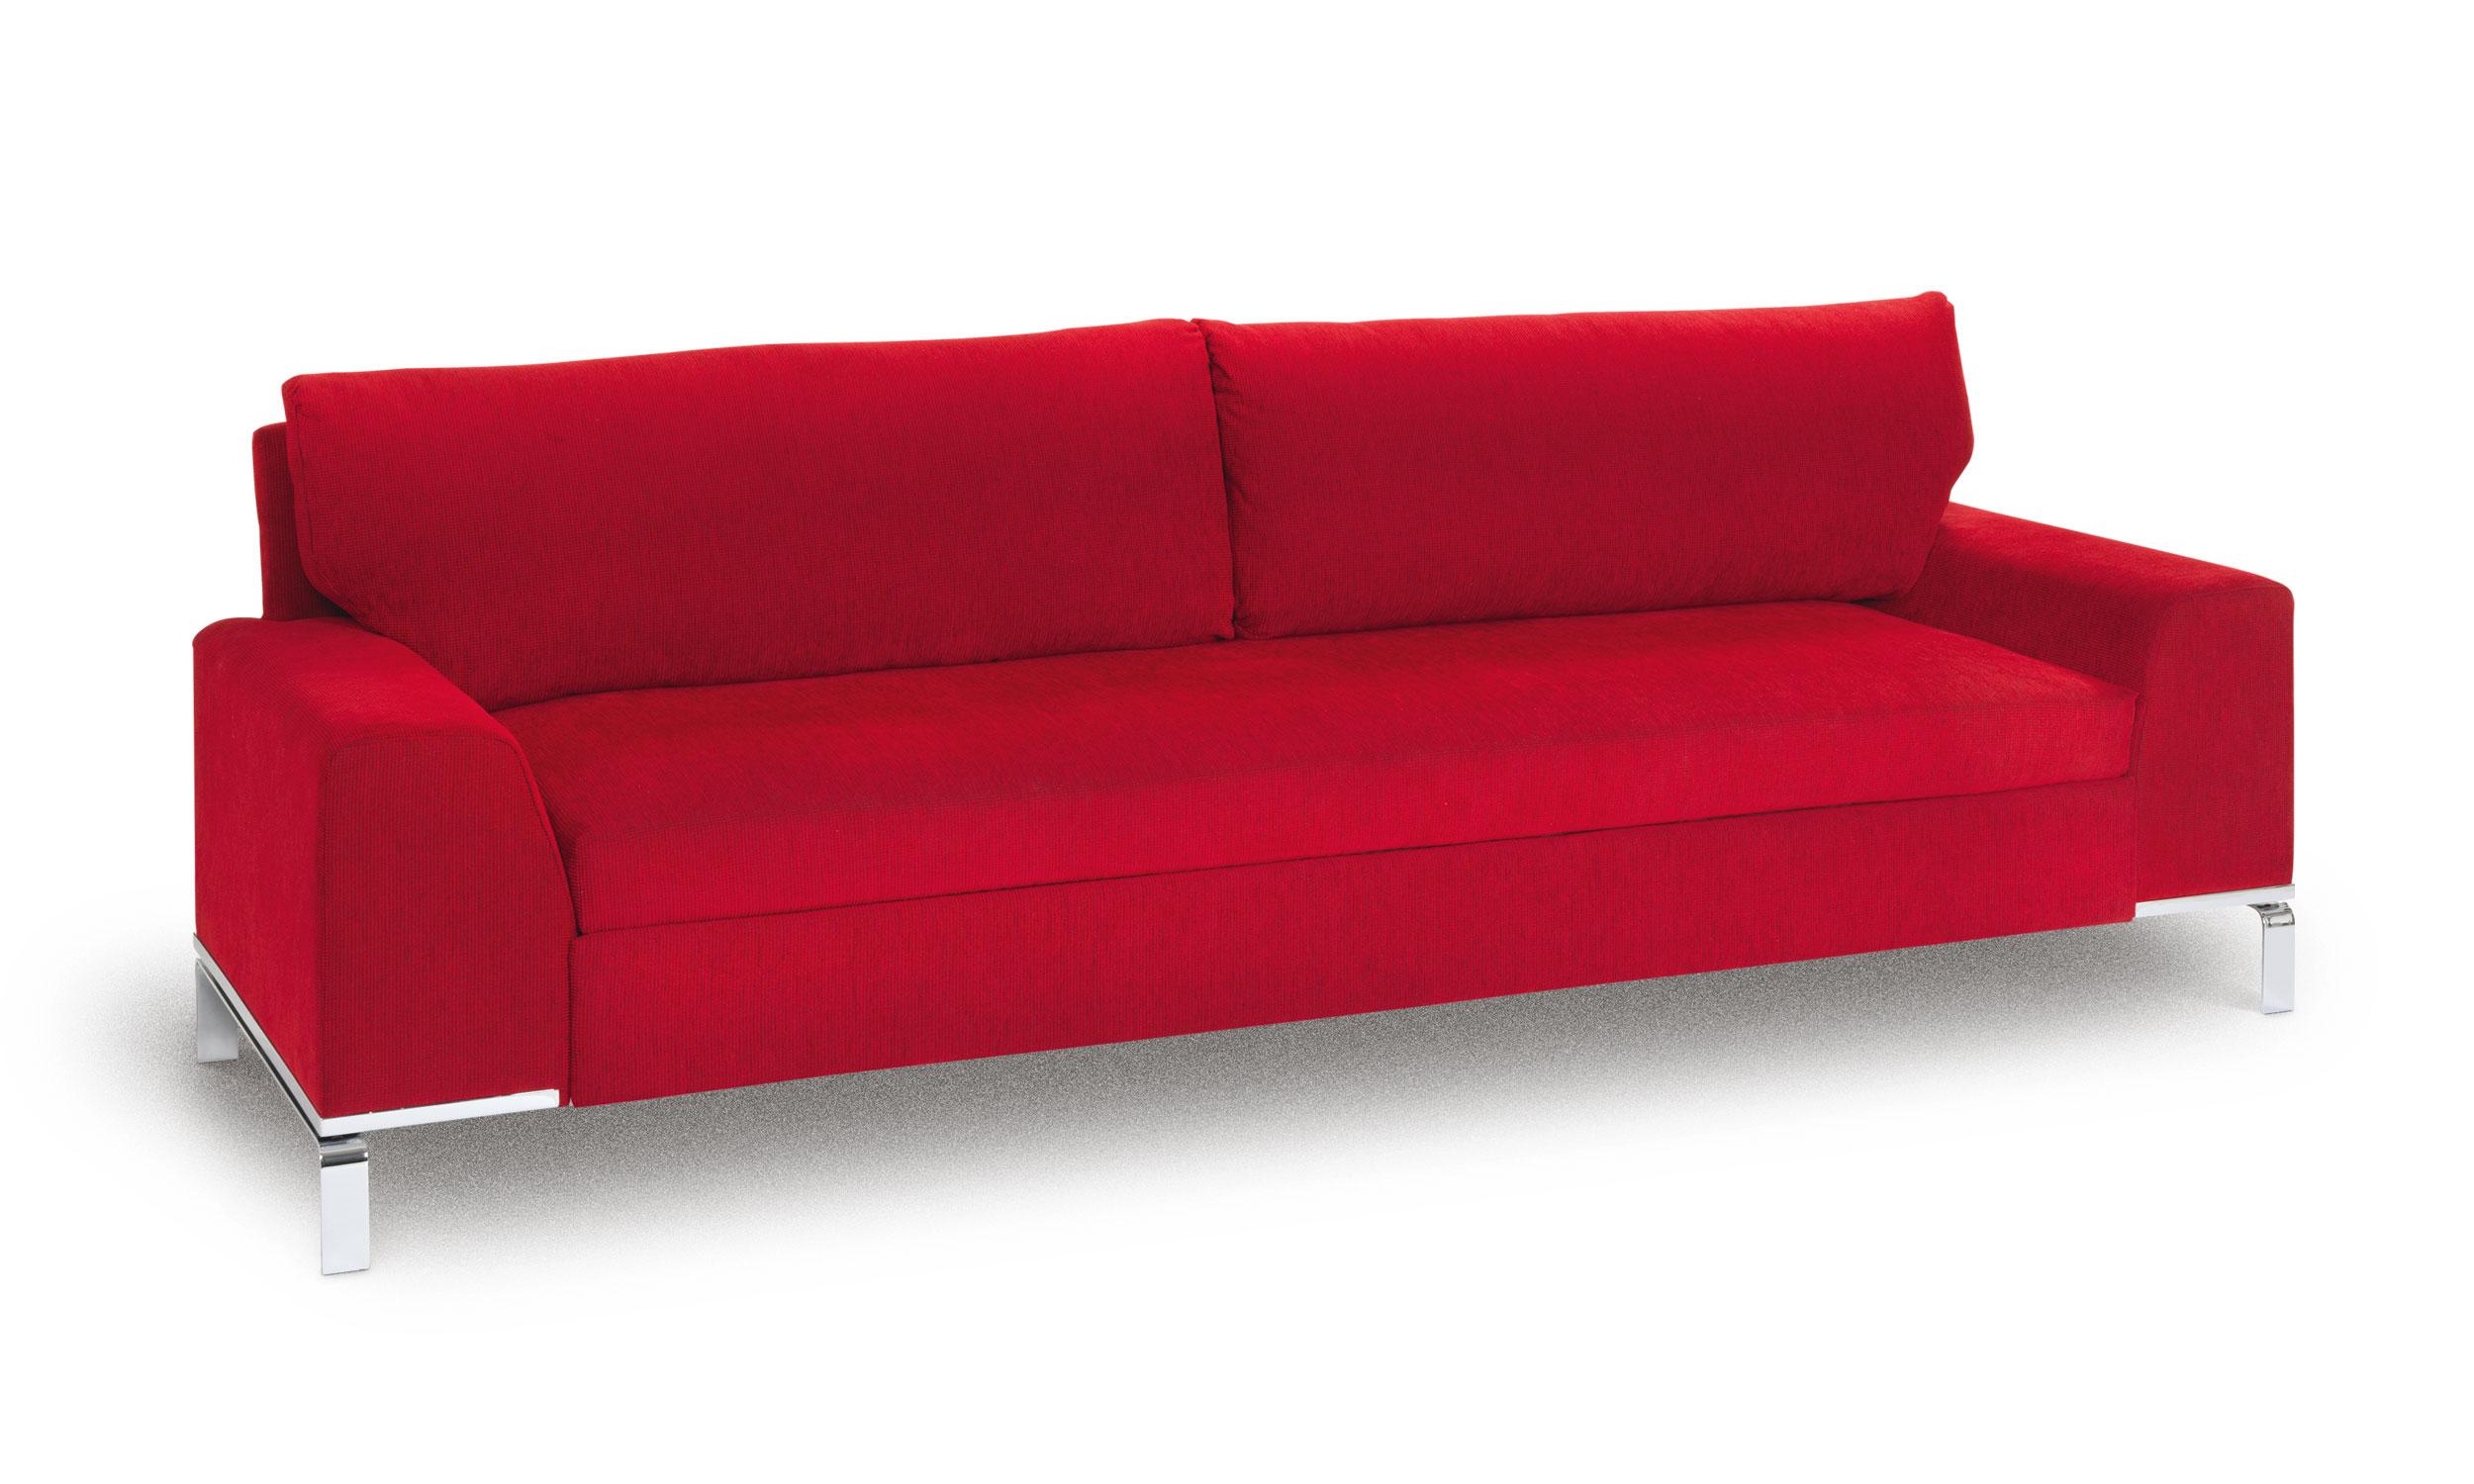 Bed for living divan swiss plus ag swissplus for Divan but